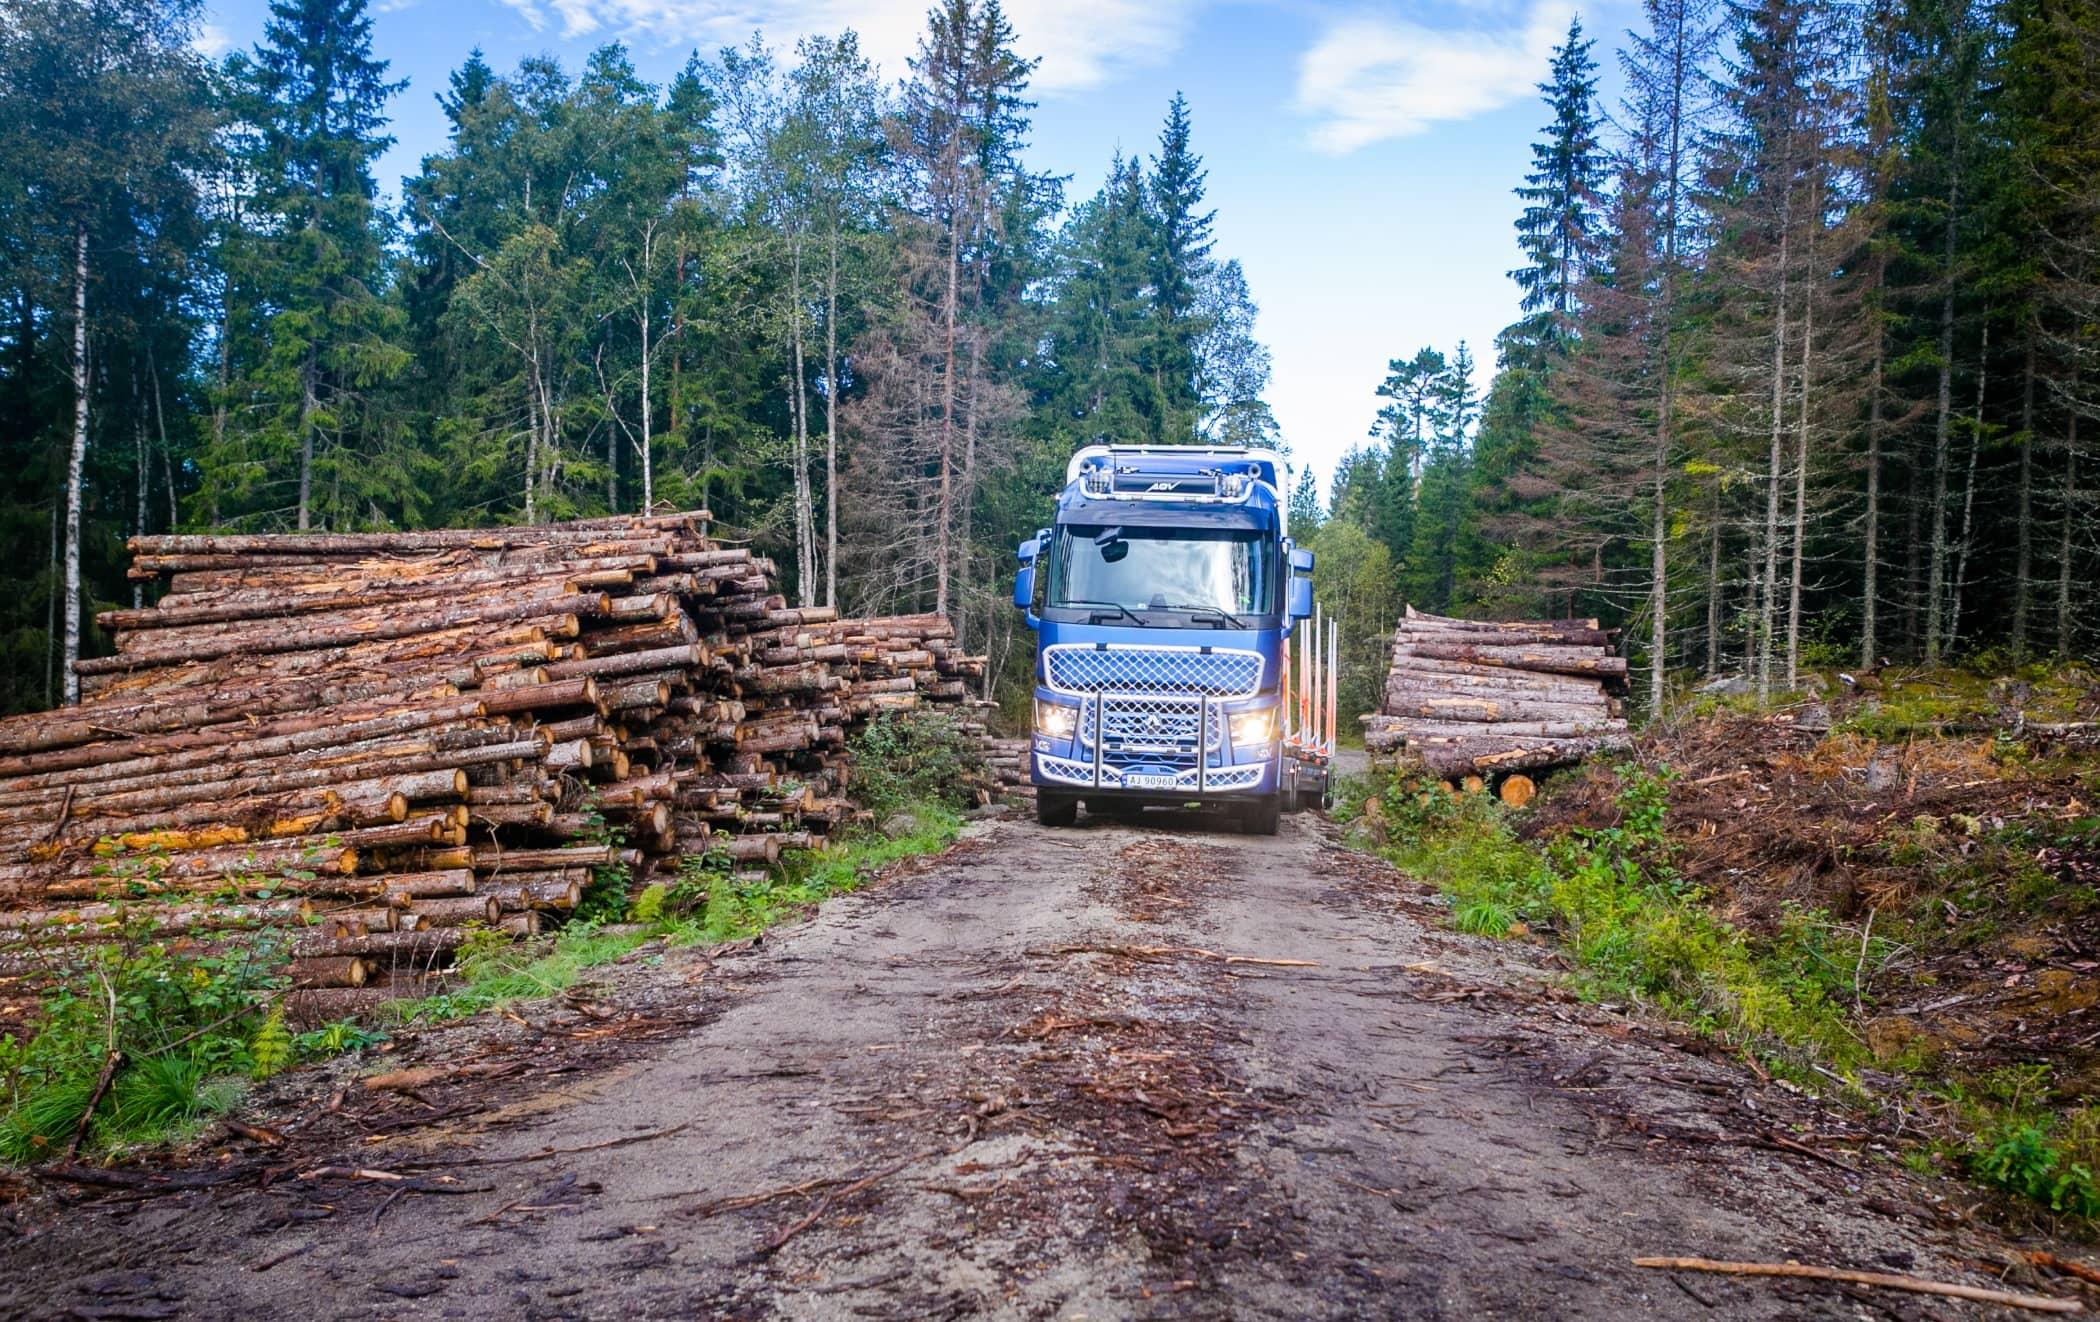 Mode of transport, Natural landscape, Woodland, Vehicle, Wilderness, Tree, Forest